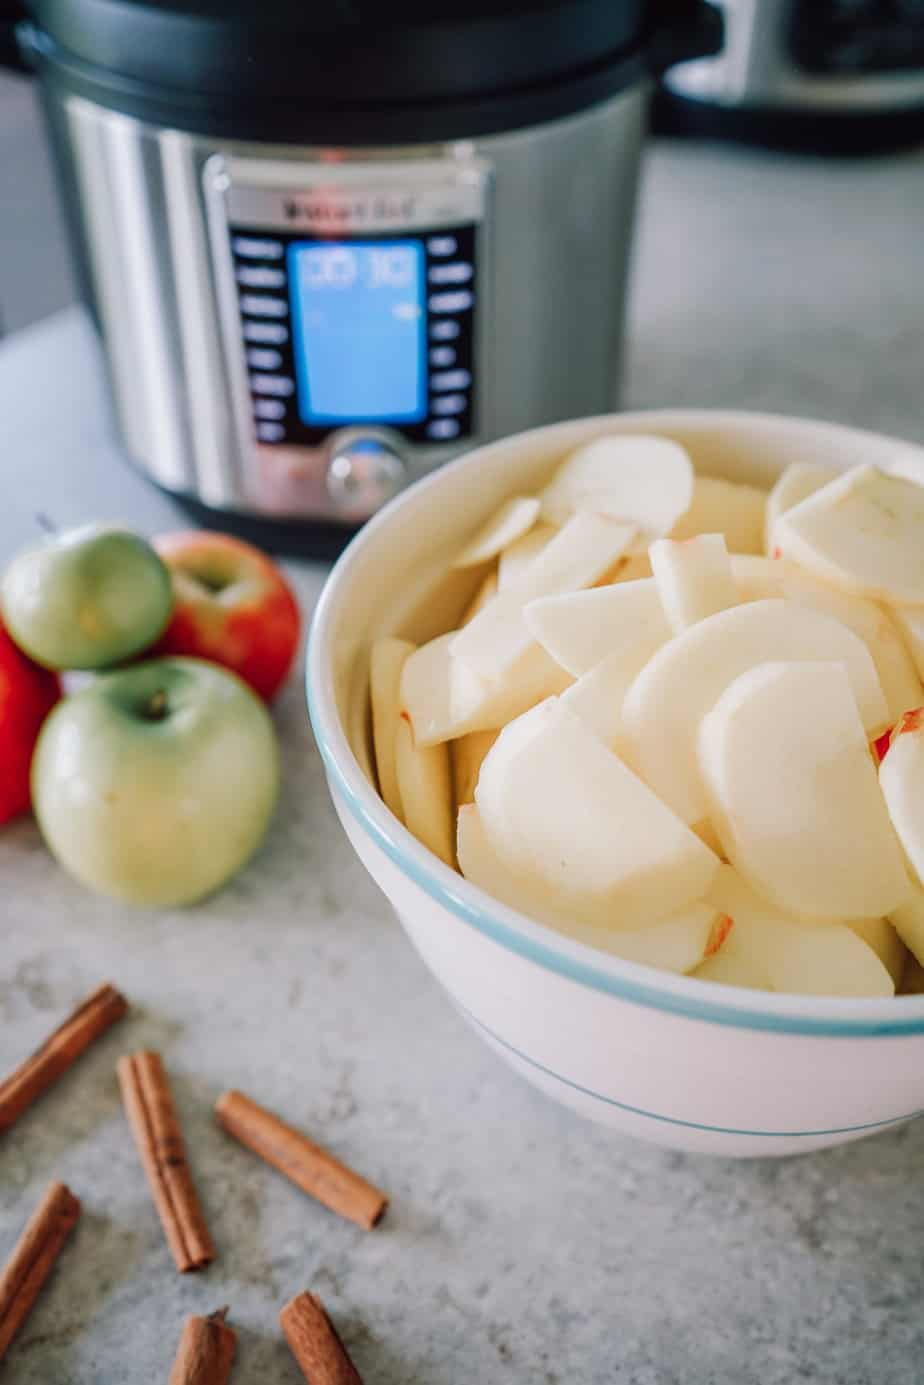 apple sauce, instant pot applesauce, Ninja Foodi applesauce, snack, side, apples, instant pot apple, Ninja Foodi apple, fruit, vegetarian, vegan